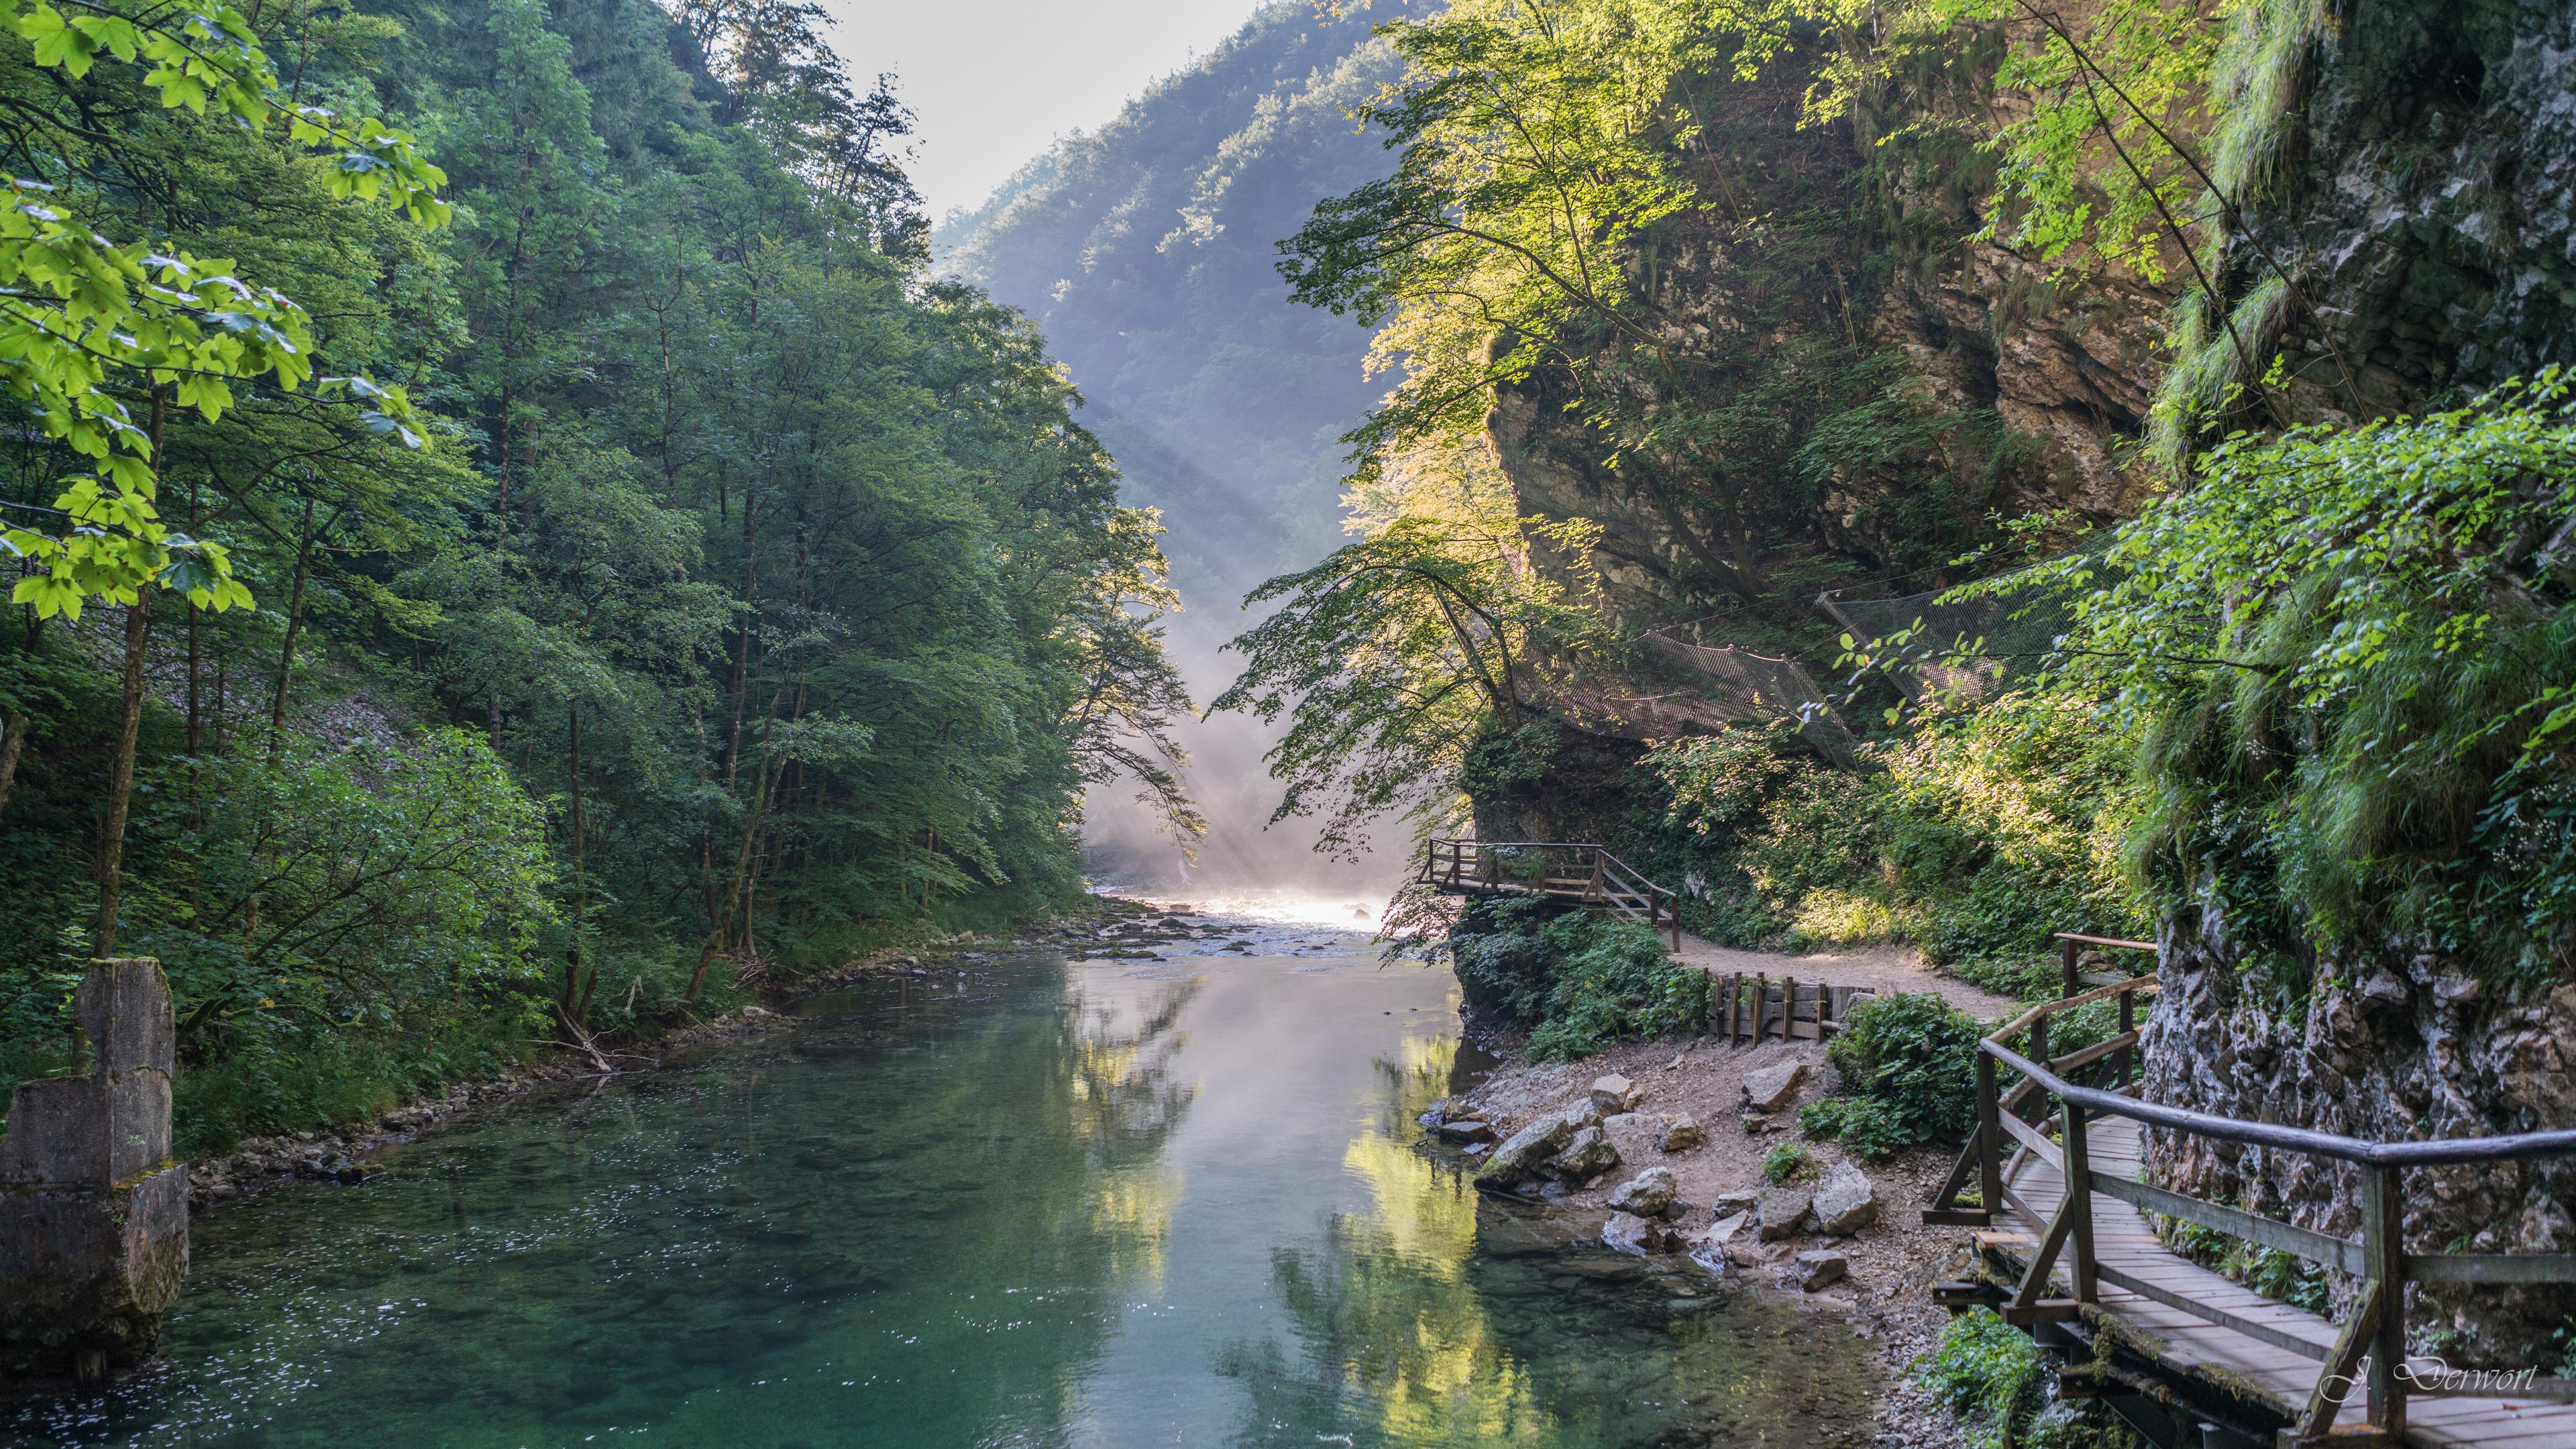 Gorges of Slovenia